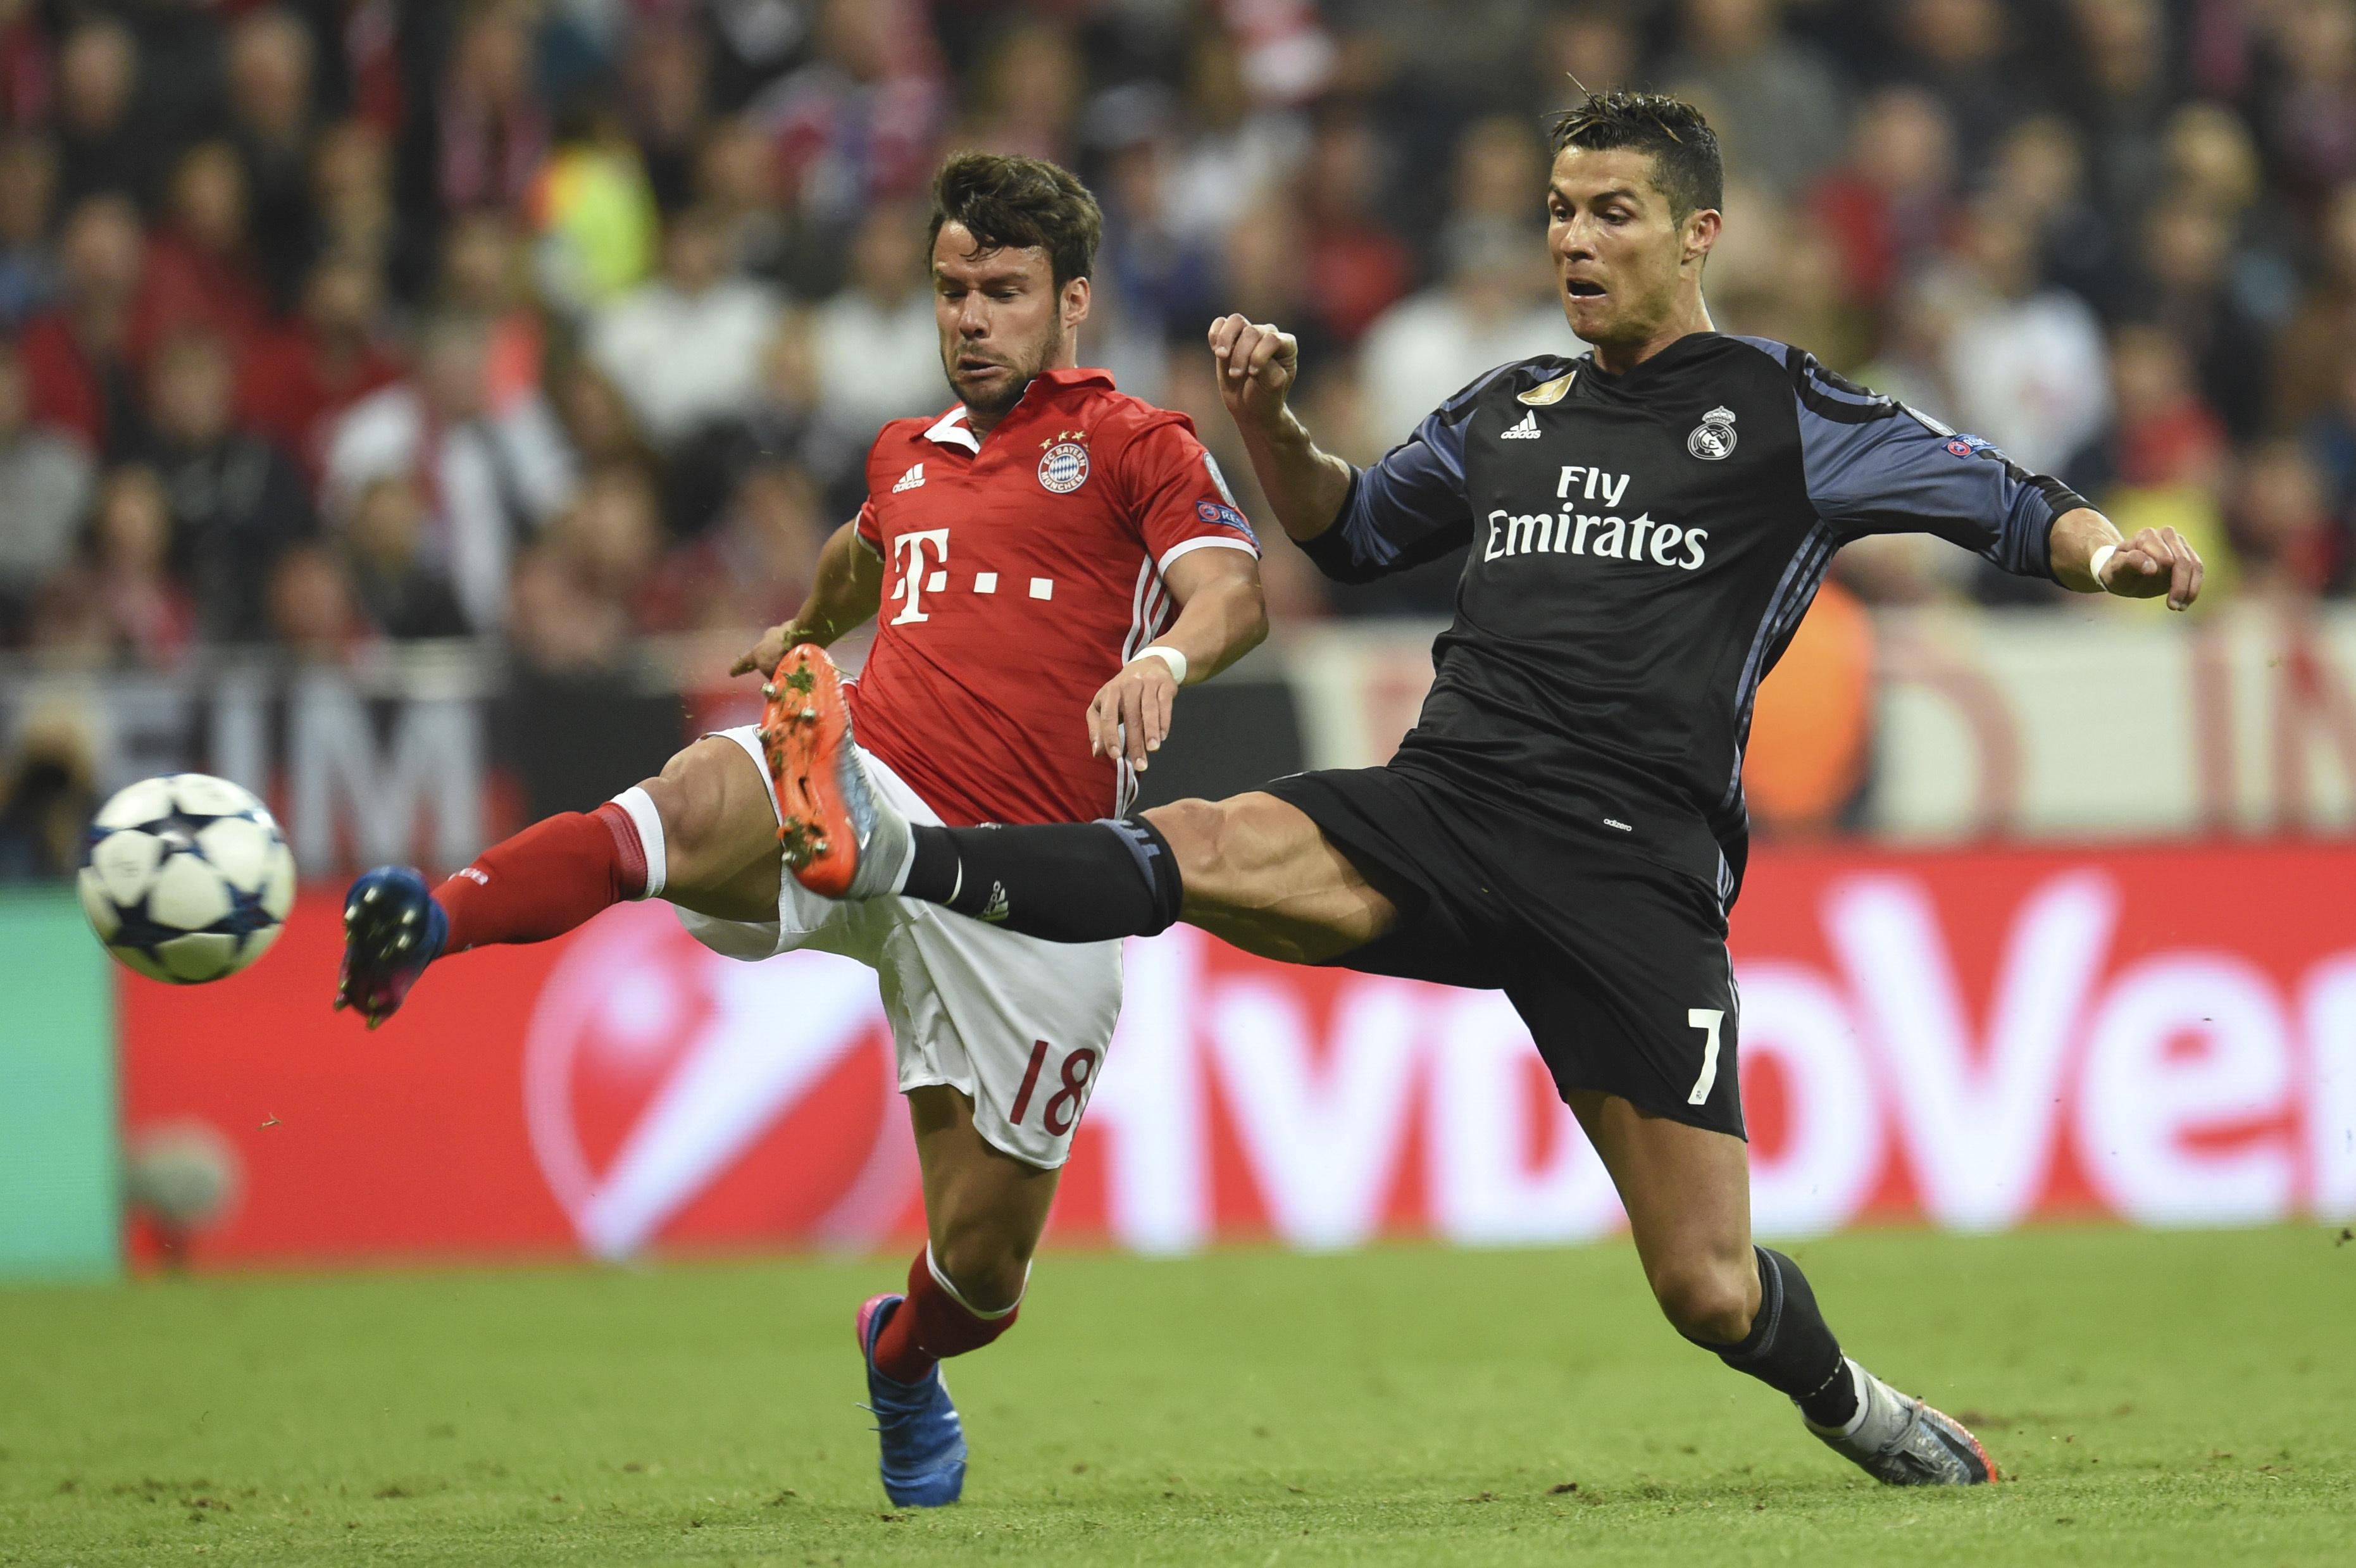 Real Madrid's Cristiano Ronaldo on his 100th European goal - News